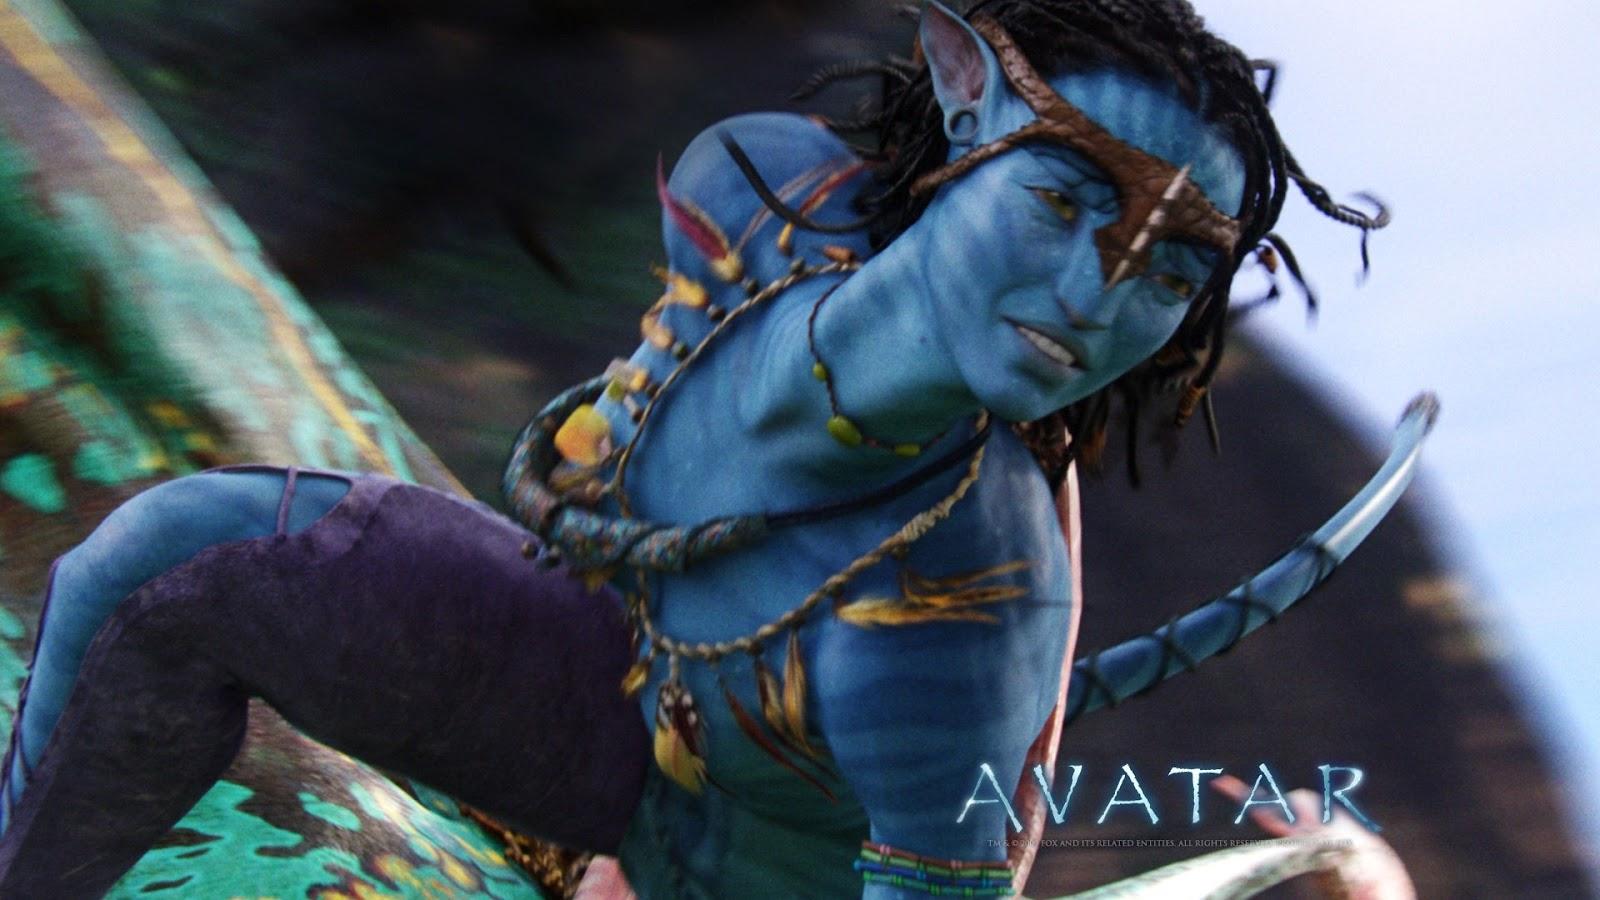 Avatar Wallpapers in HD  1080p Wallpaper Store for Desktop screen 1600x900